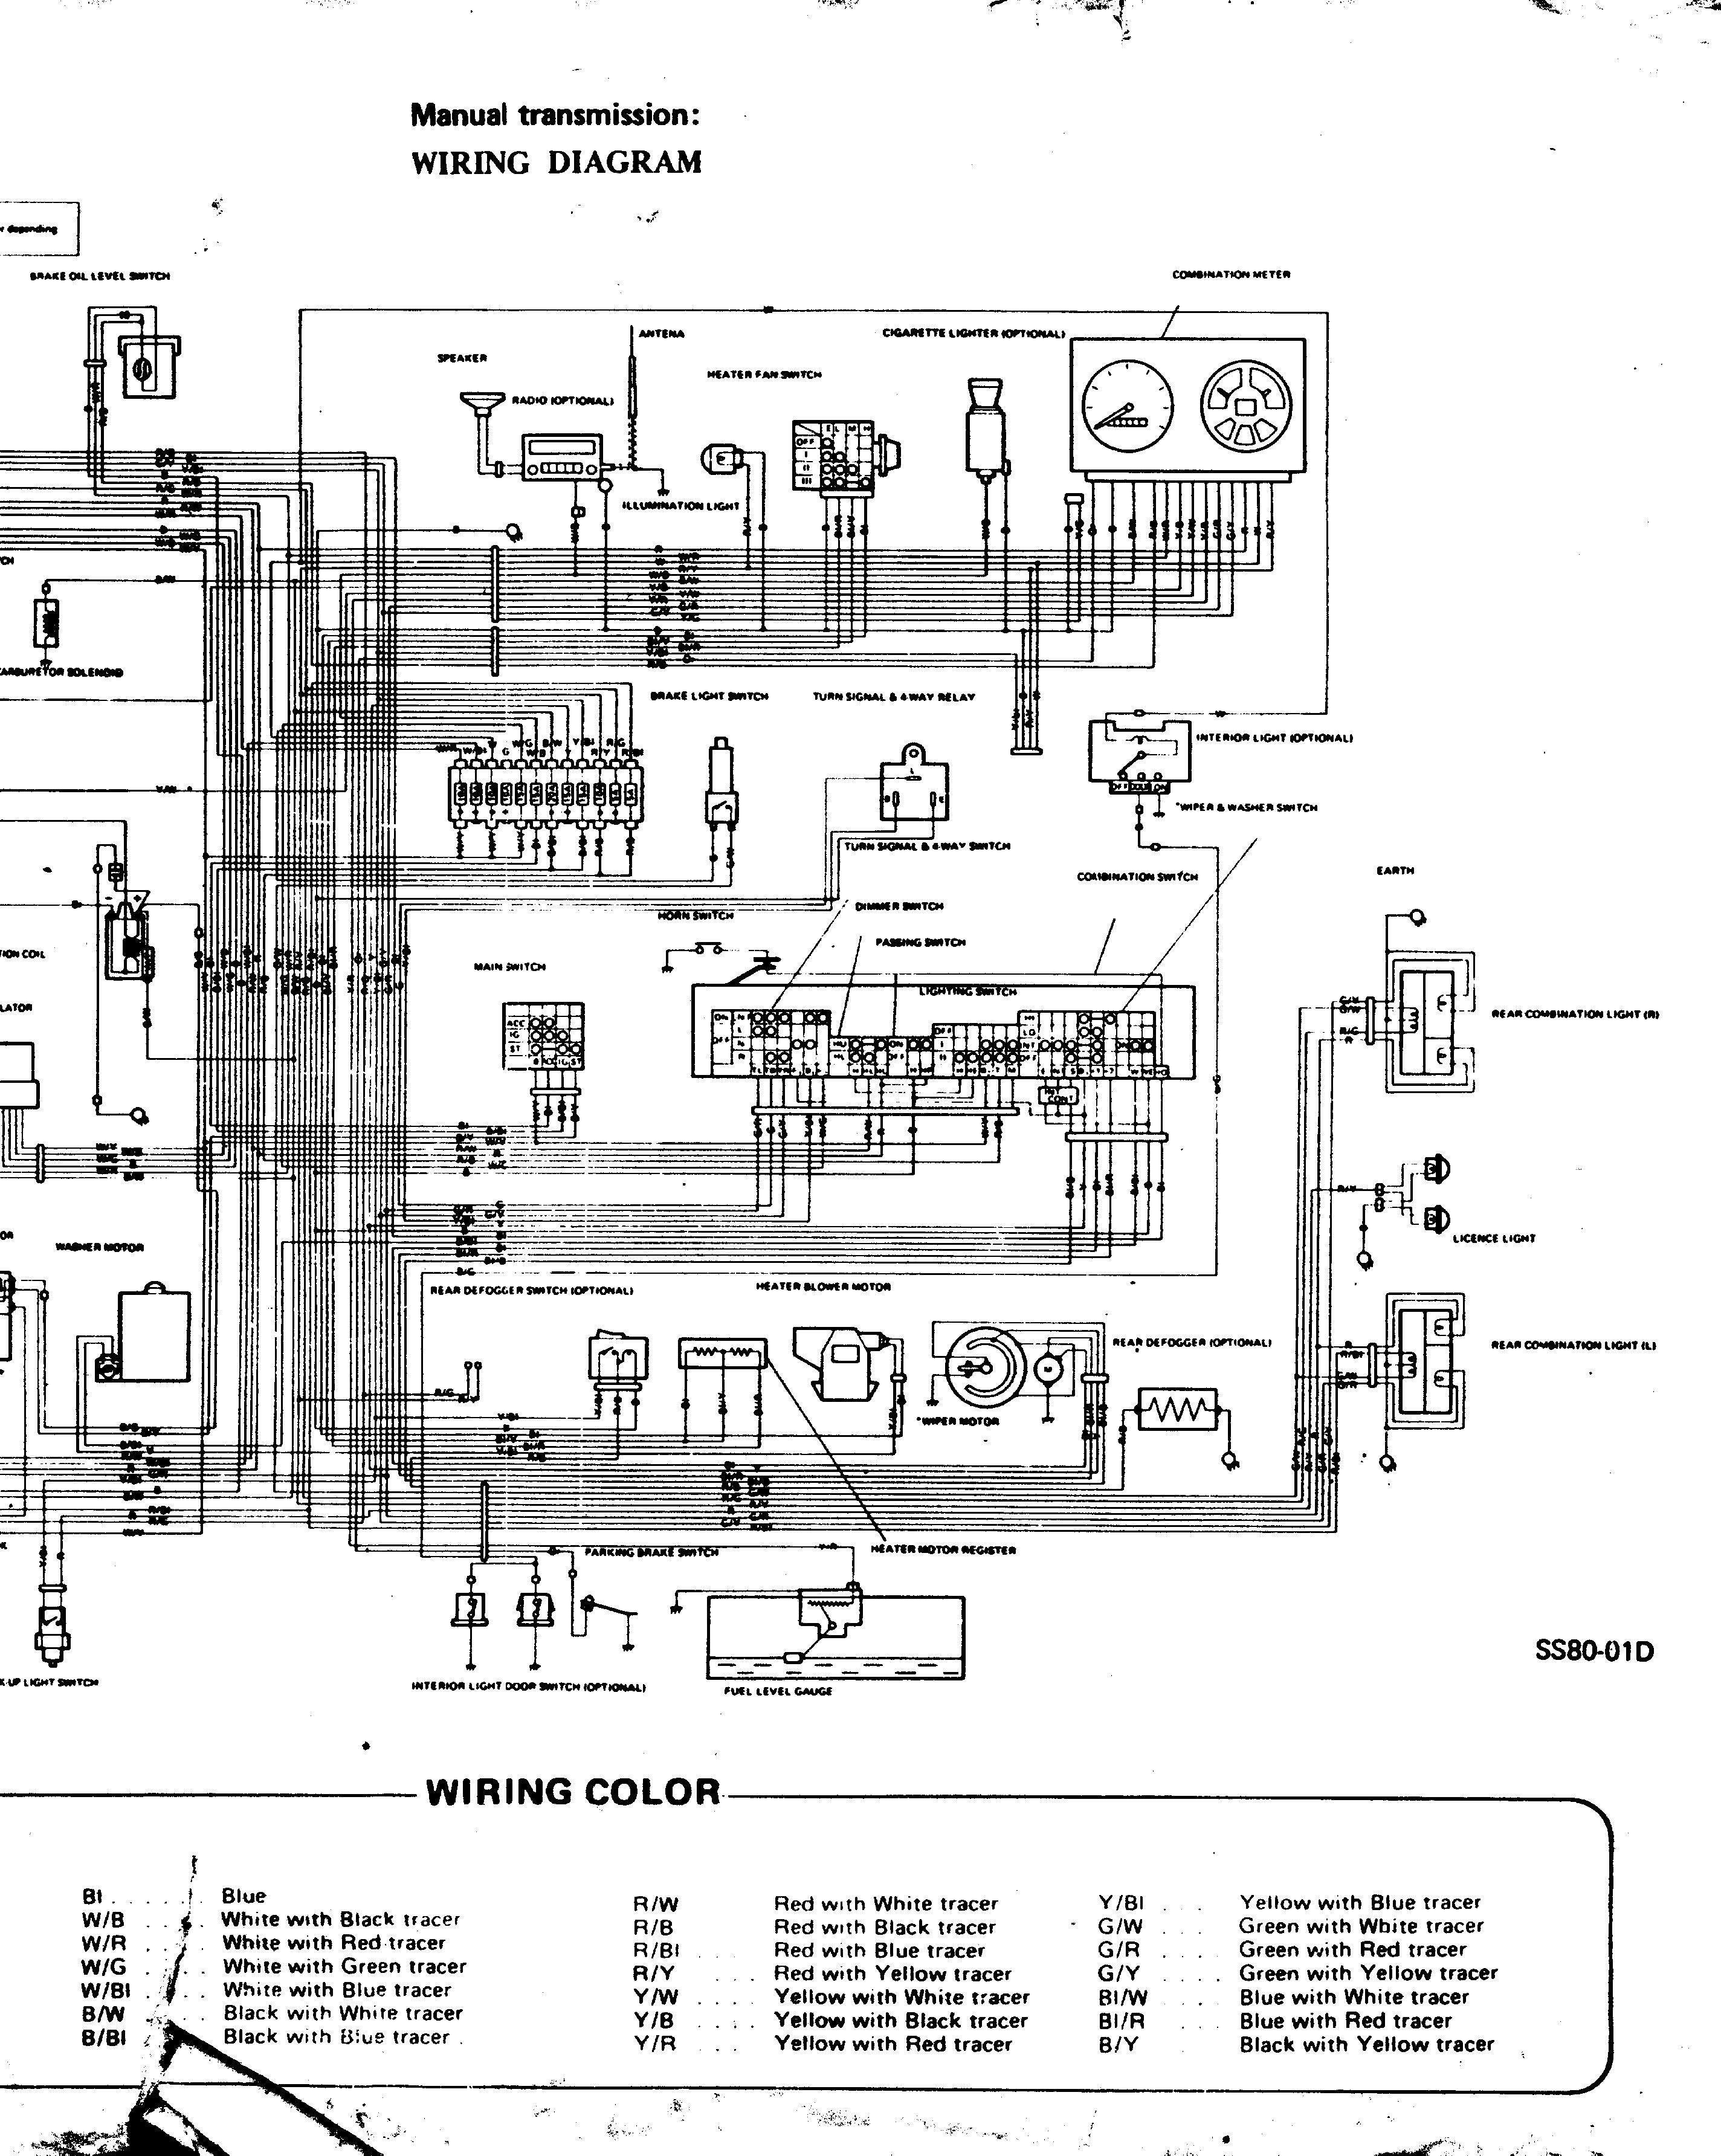 2001 Yamaha Blaster Clutch Wiring Diagram